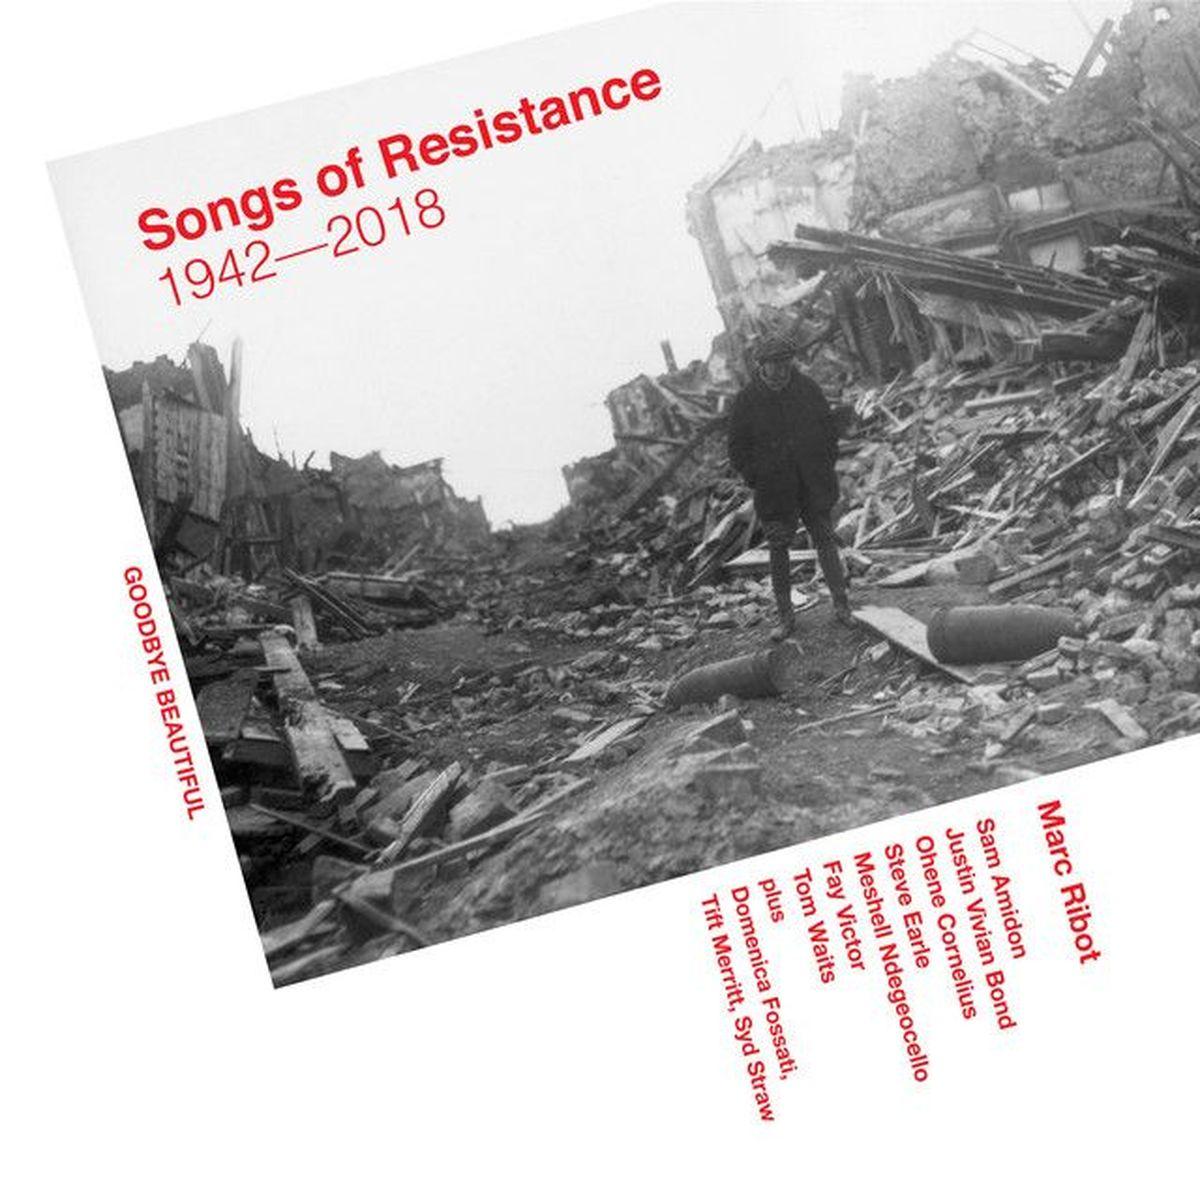 √ Marc Ribot - SONGS OF RESISTANCE 1942-2018 - la recensione di Rockol.it